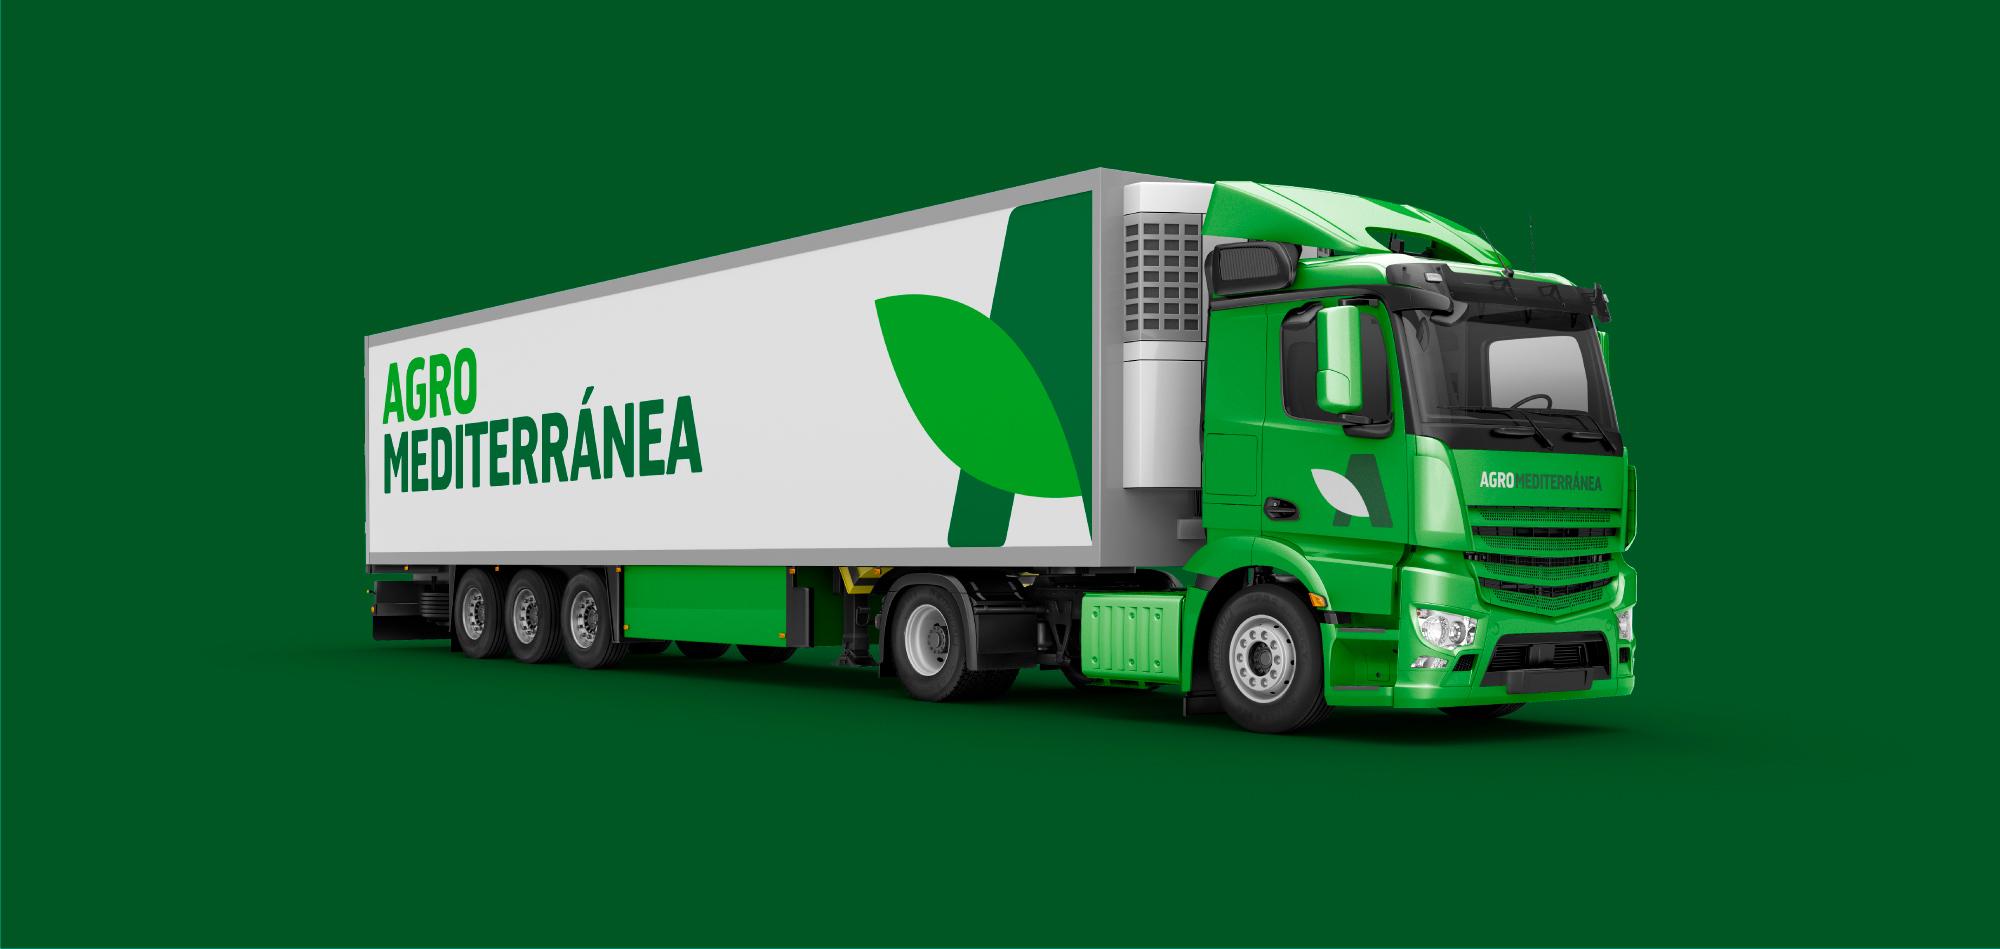 Agromediterranea-branding-03